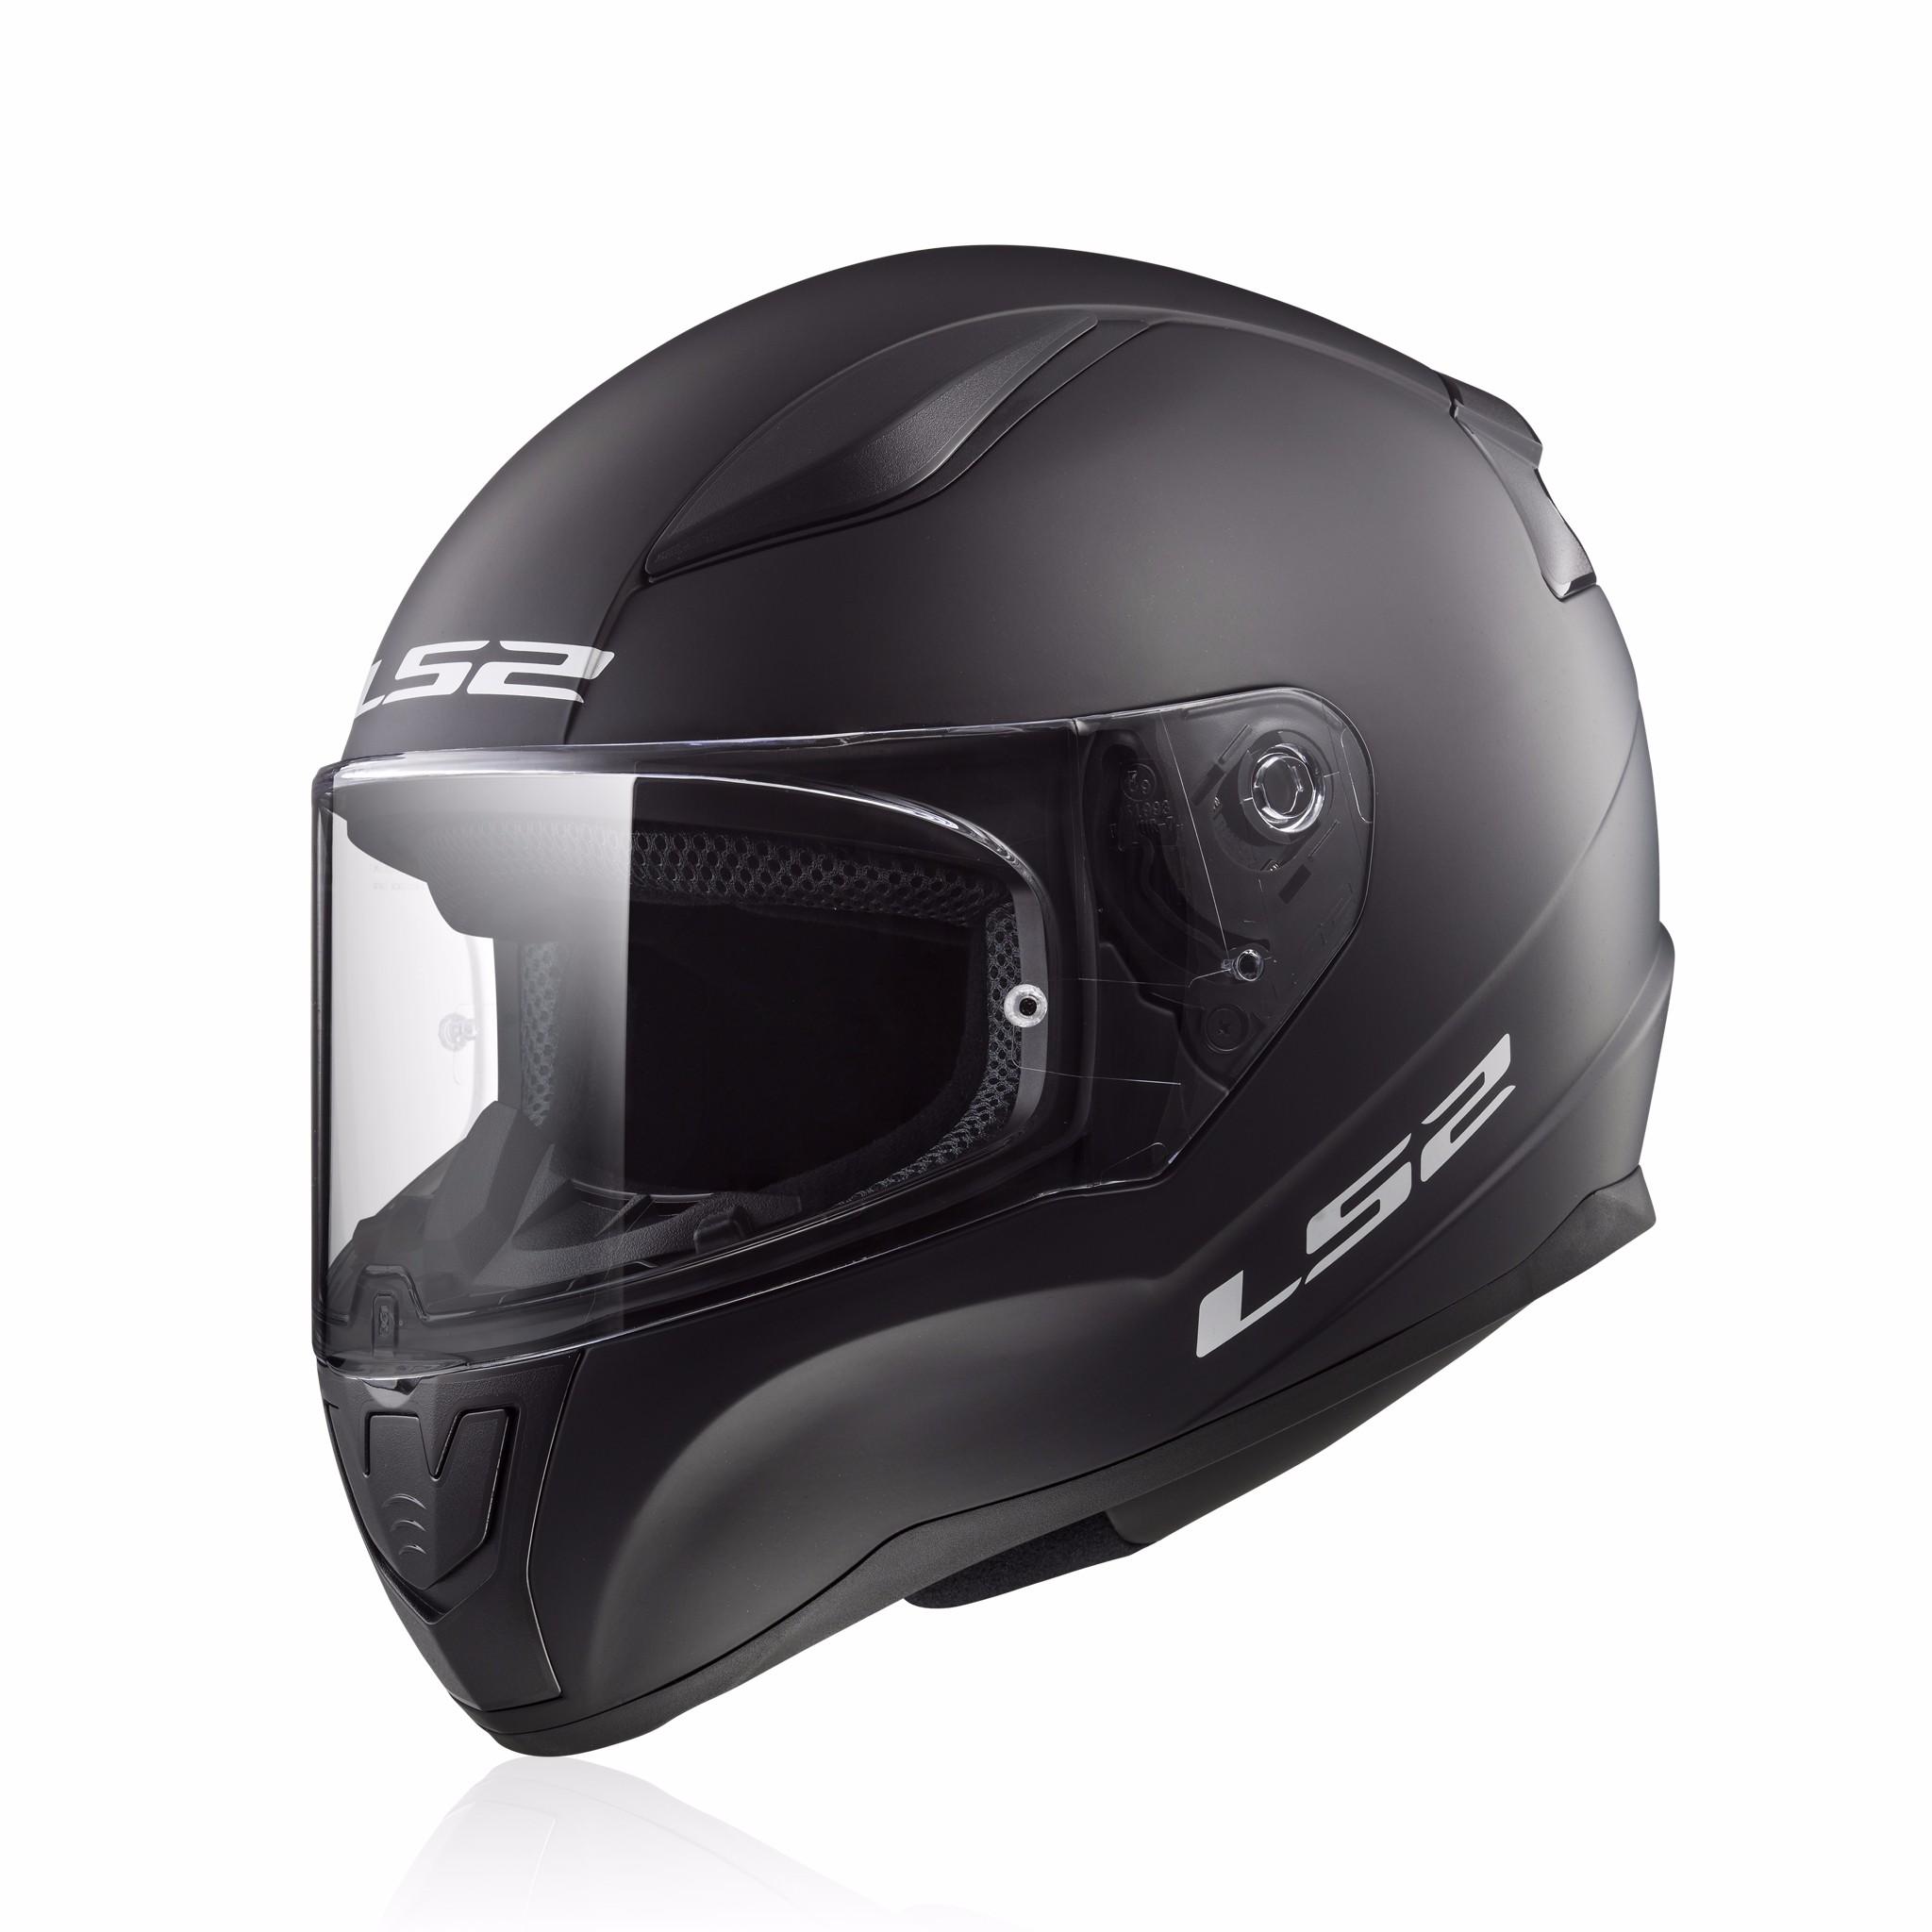 Mũ bảo hiểm fullface LS2 Rapid FF353 đen nhám